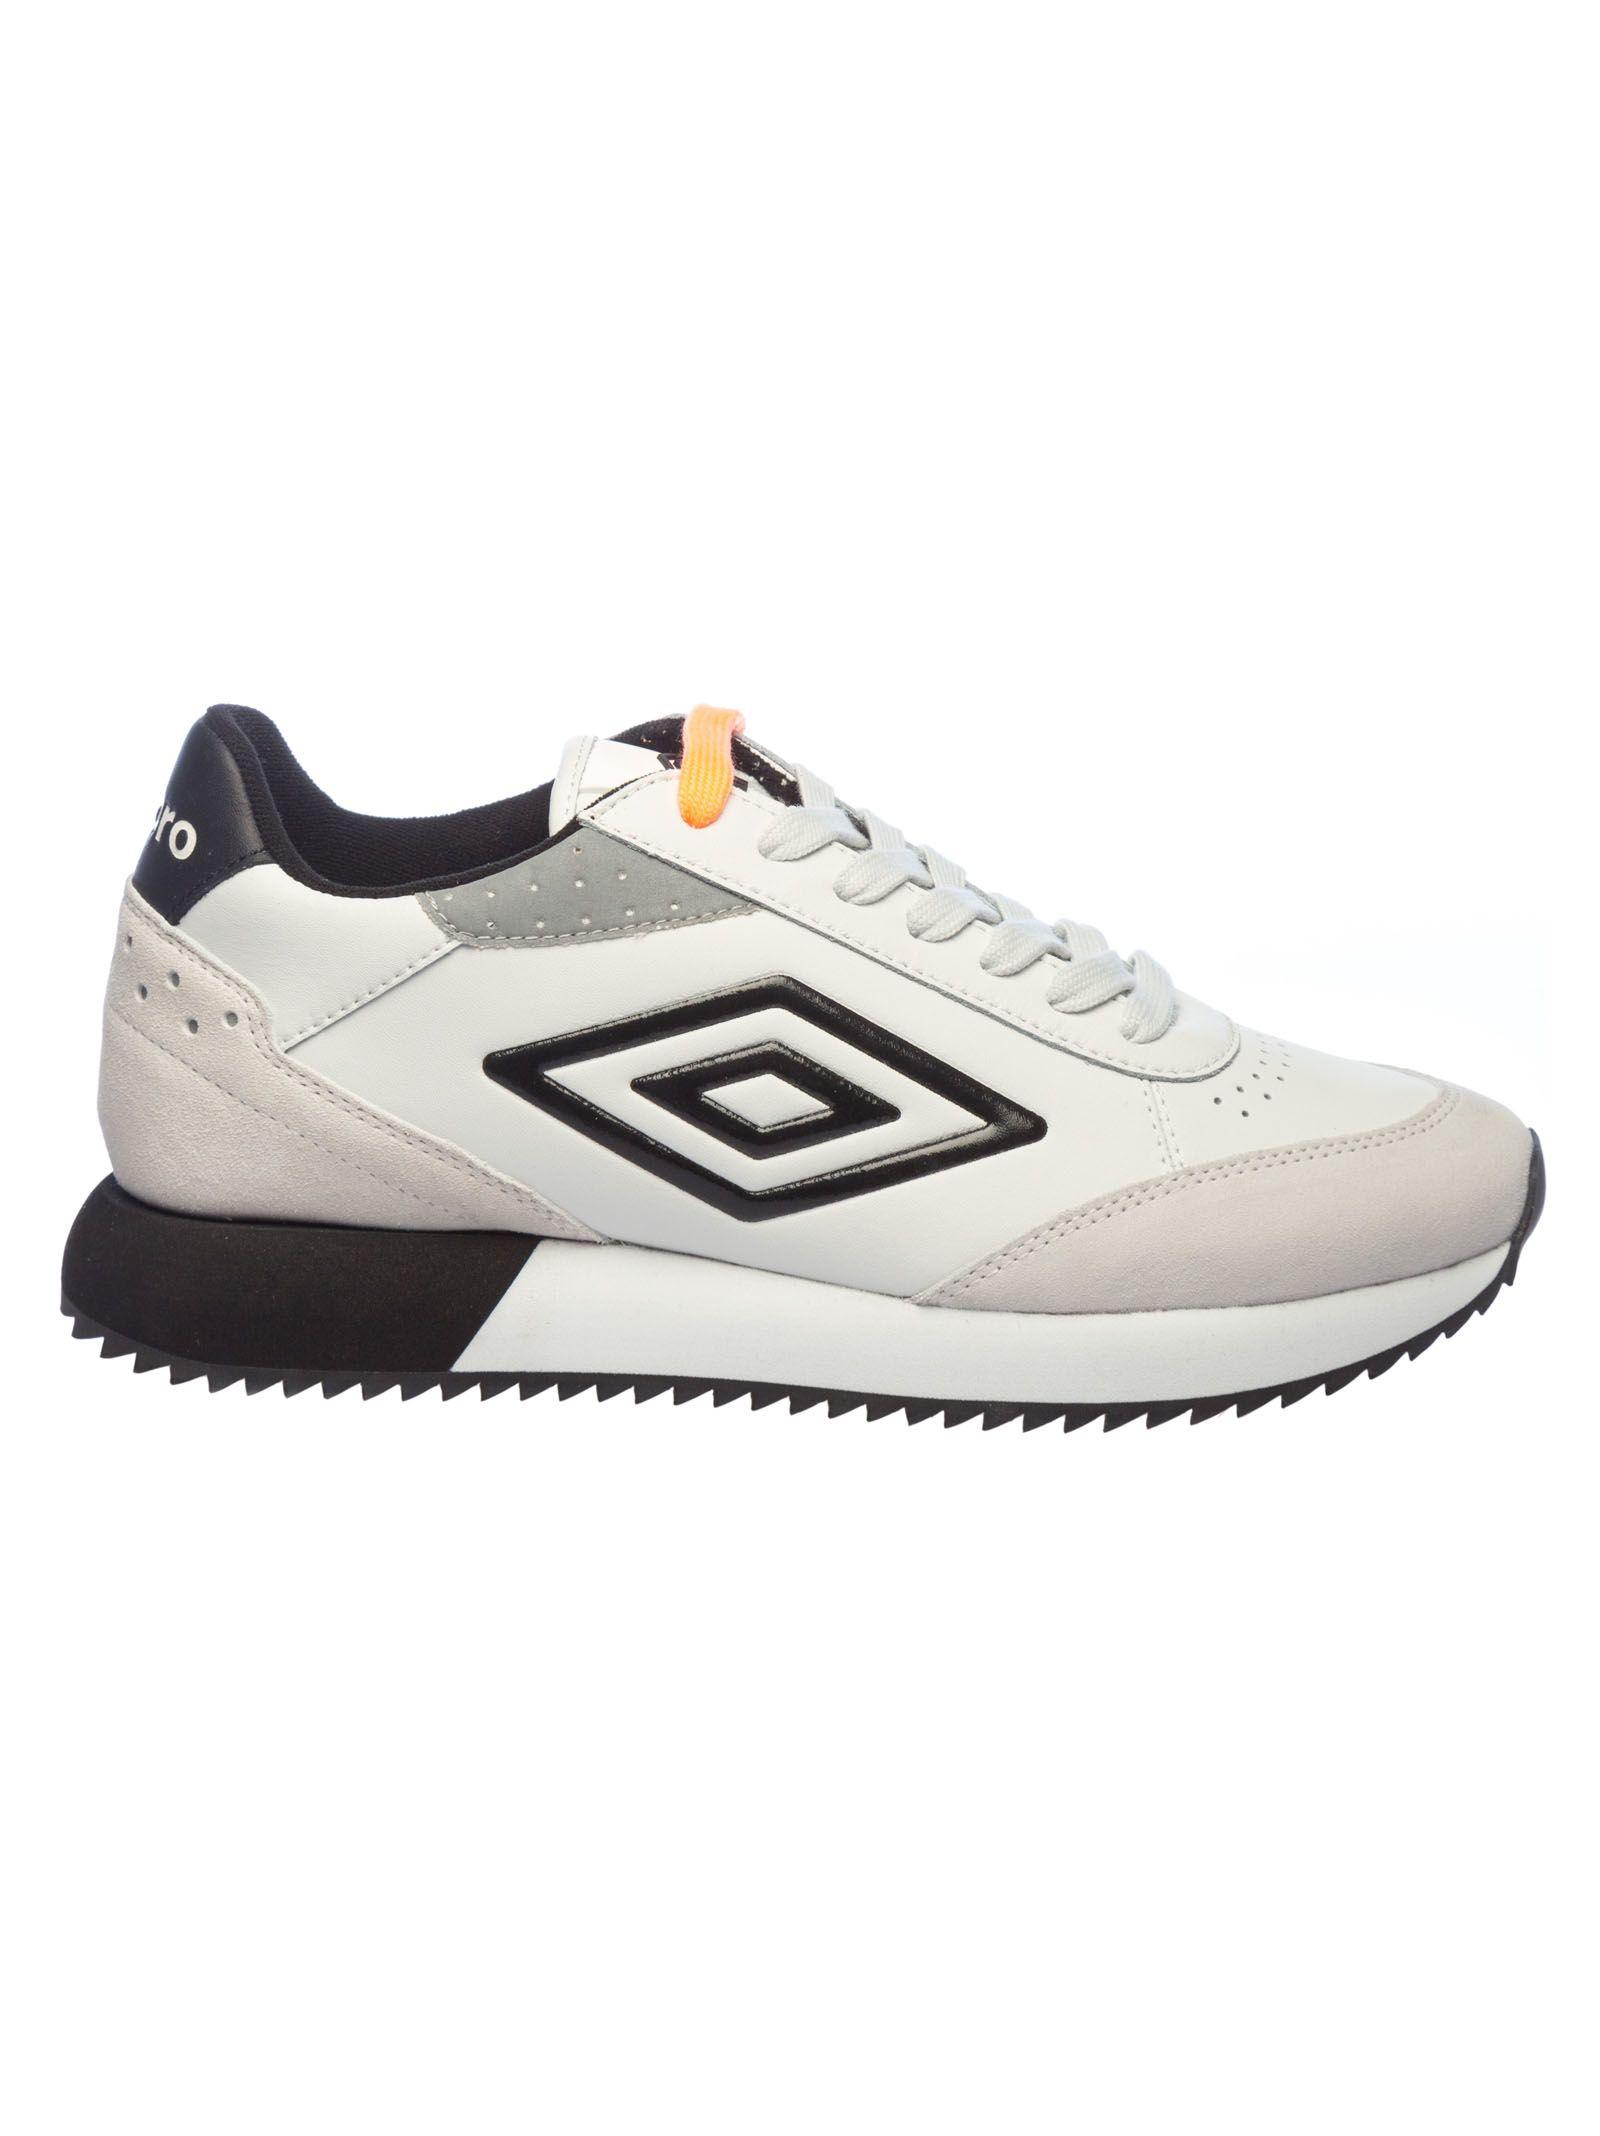 UMBRO Classic Running Sneakers in White/Black